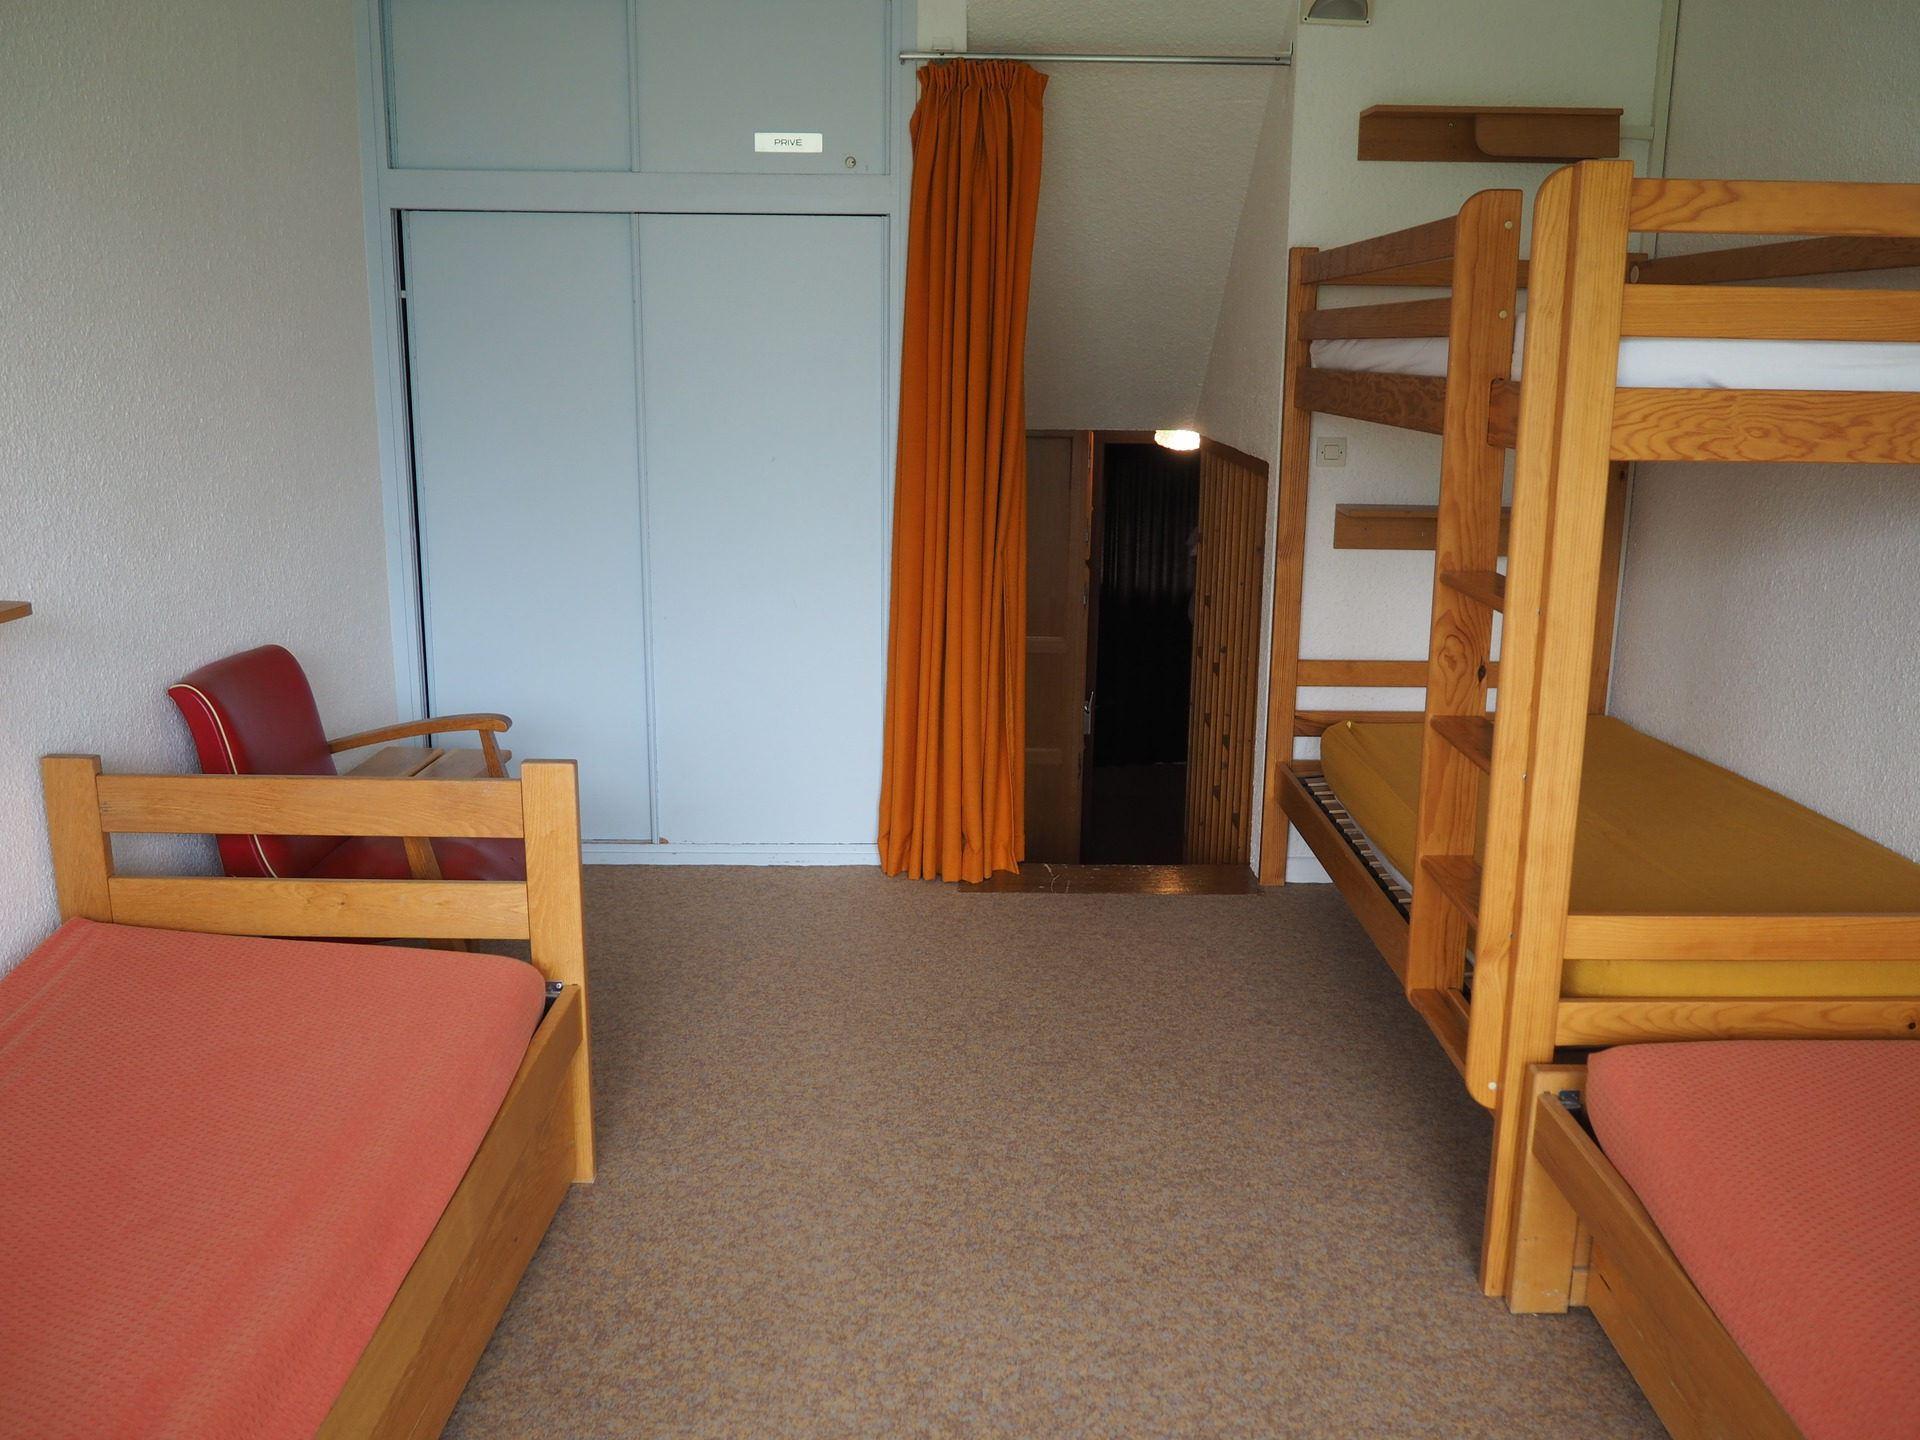 3 Rooms 8 Pers ski-in ski-out / NANT BENOIT 419